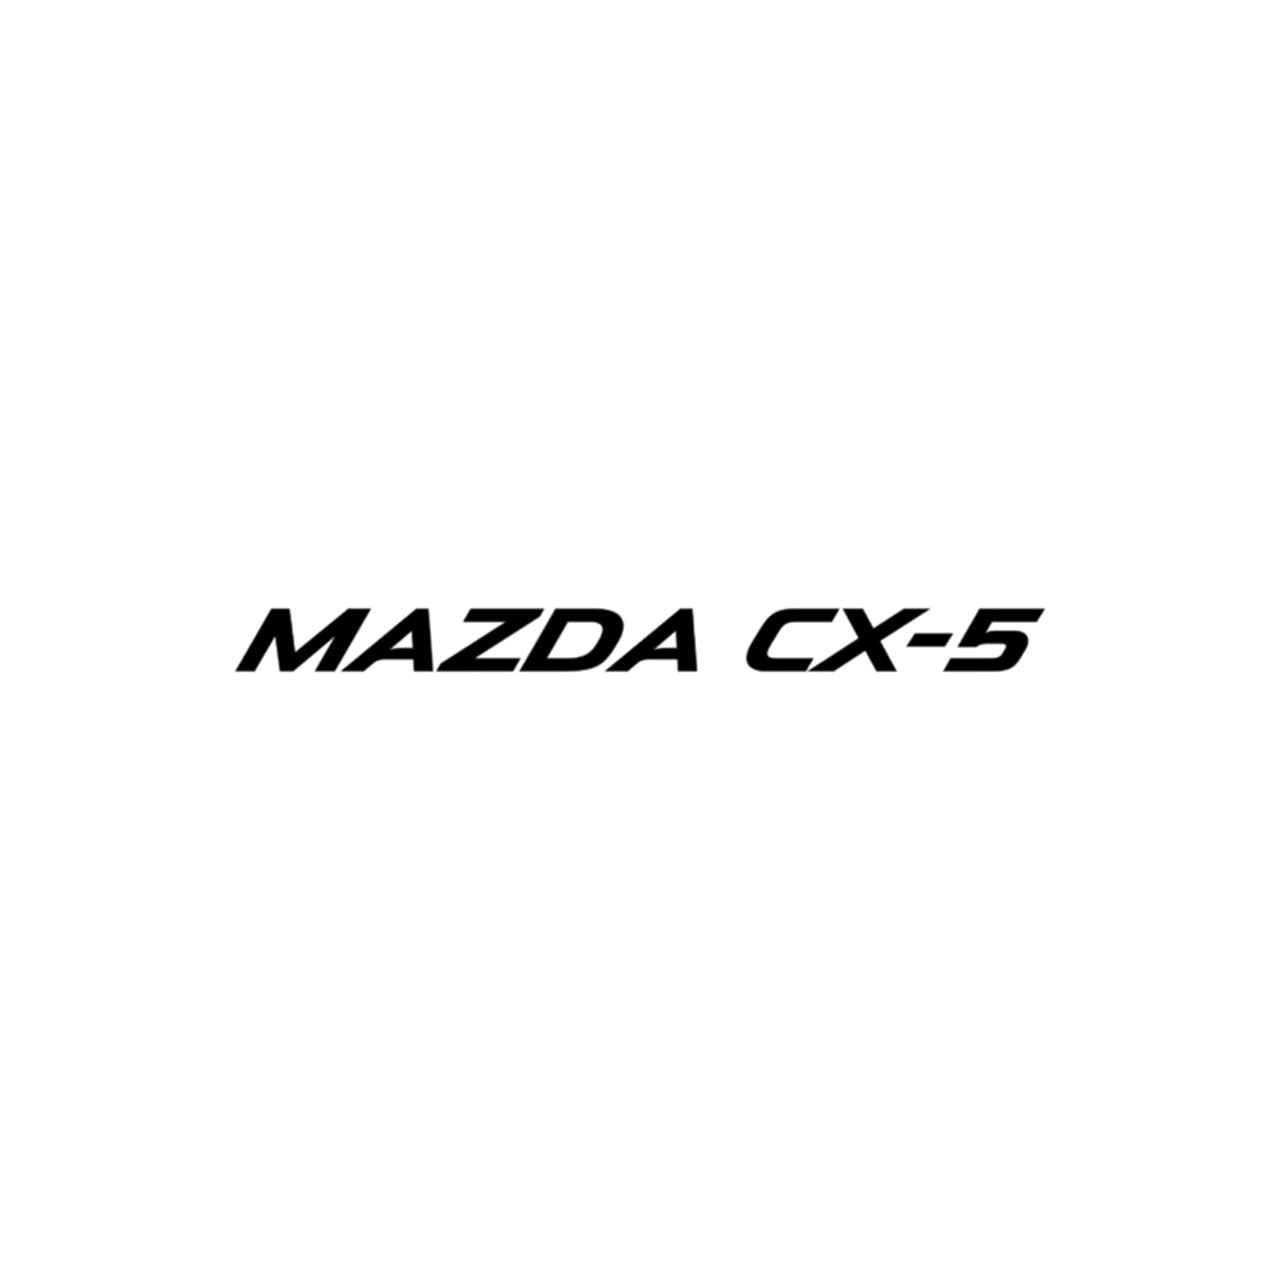 Mazda cx 5 vinyl decal ballzbeatz com